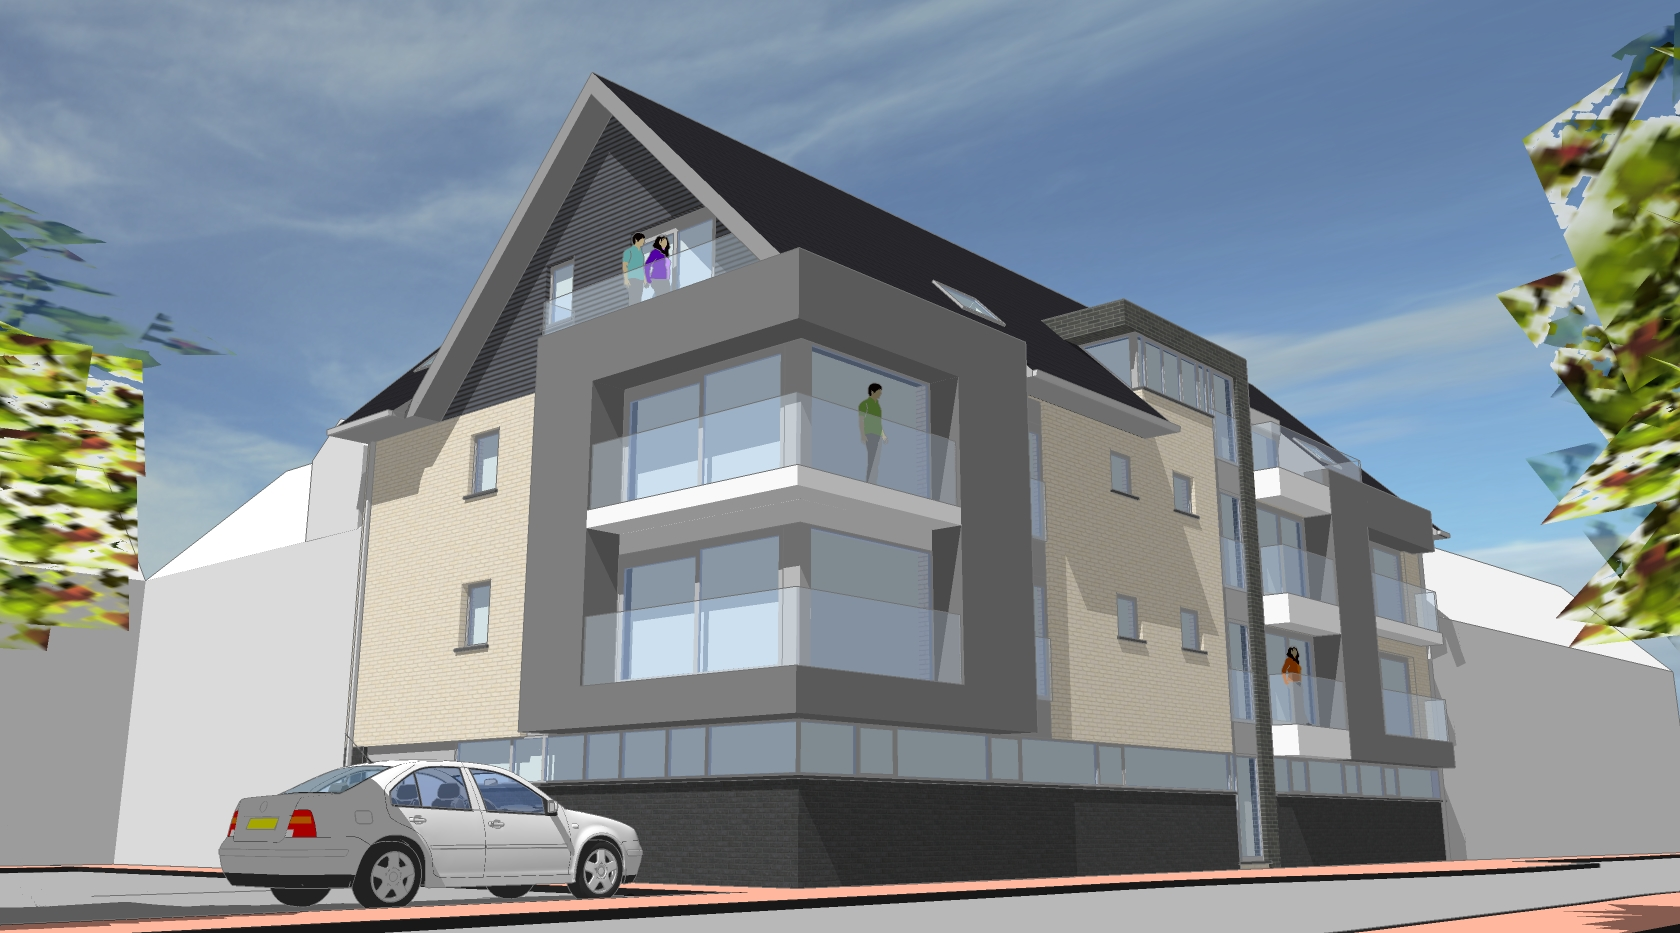 3D model Beuselinck zwarte dakpan 01.jpg